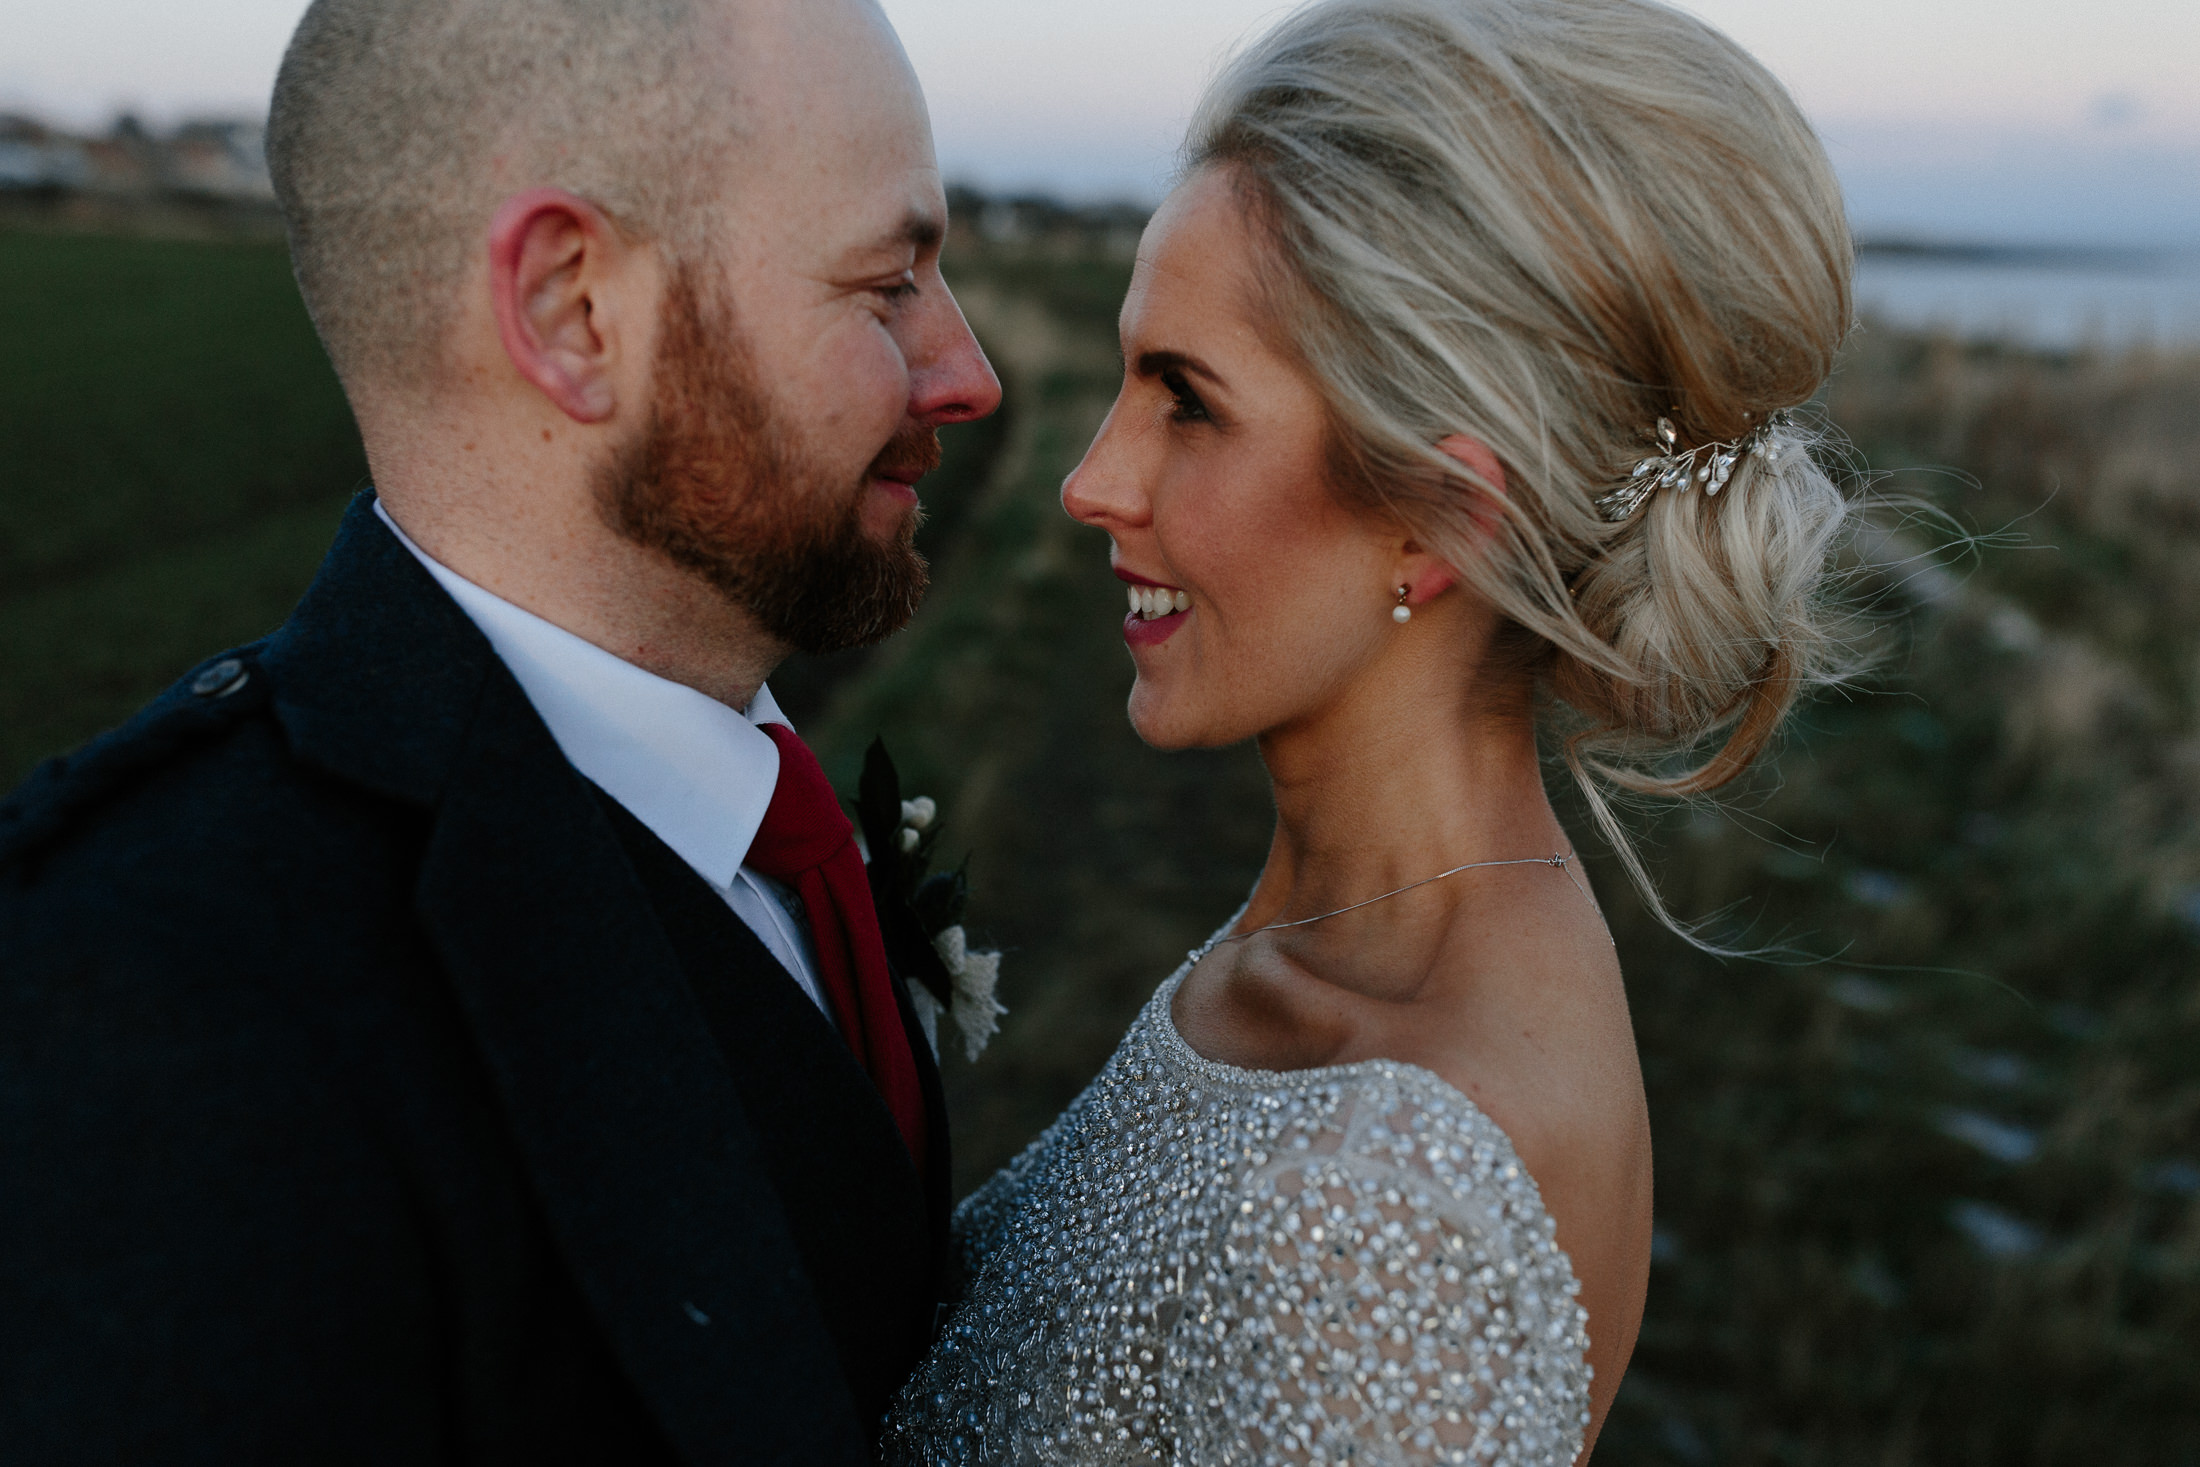 Kayleigh-Michael-Cow-Shed-Cowshed-Crail-Fife-Coastal-Rustic-Barn-Lianne-Mackay-Wedding-Photography-Photographer-Edinburgh-Glasgow-Scotland-WEB-RES-528.jpg